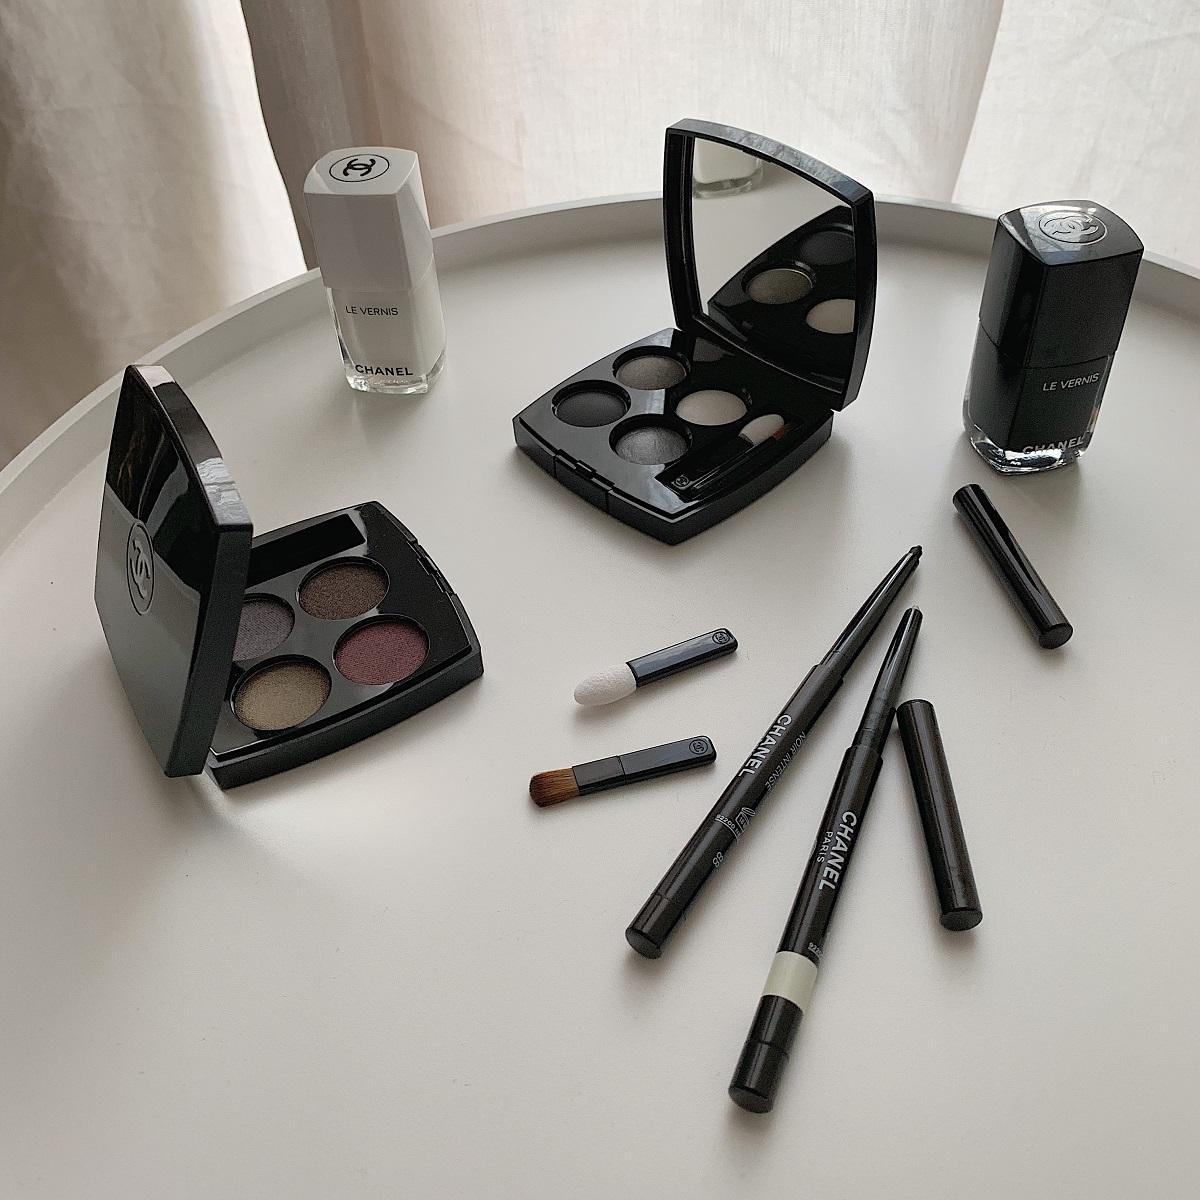 chanel products Noir et Blanc Chanel (7)